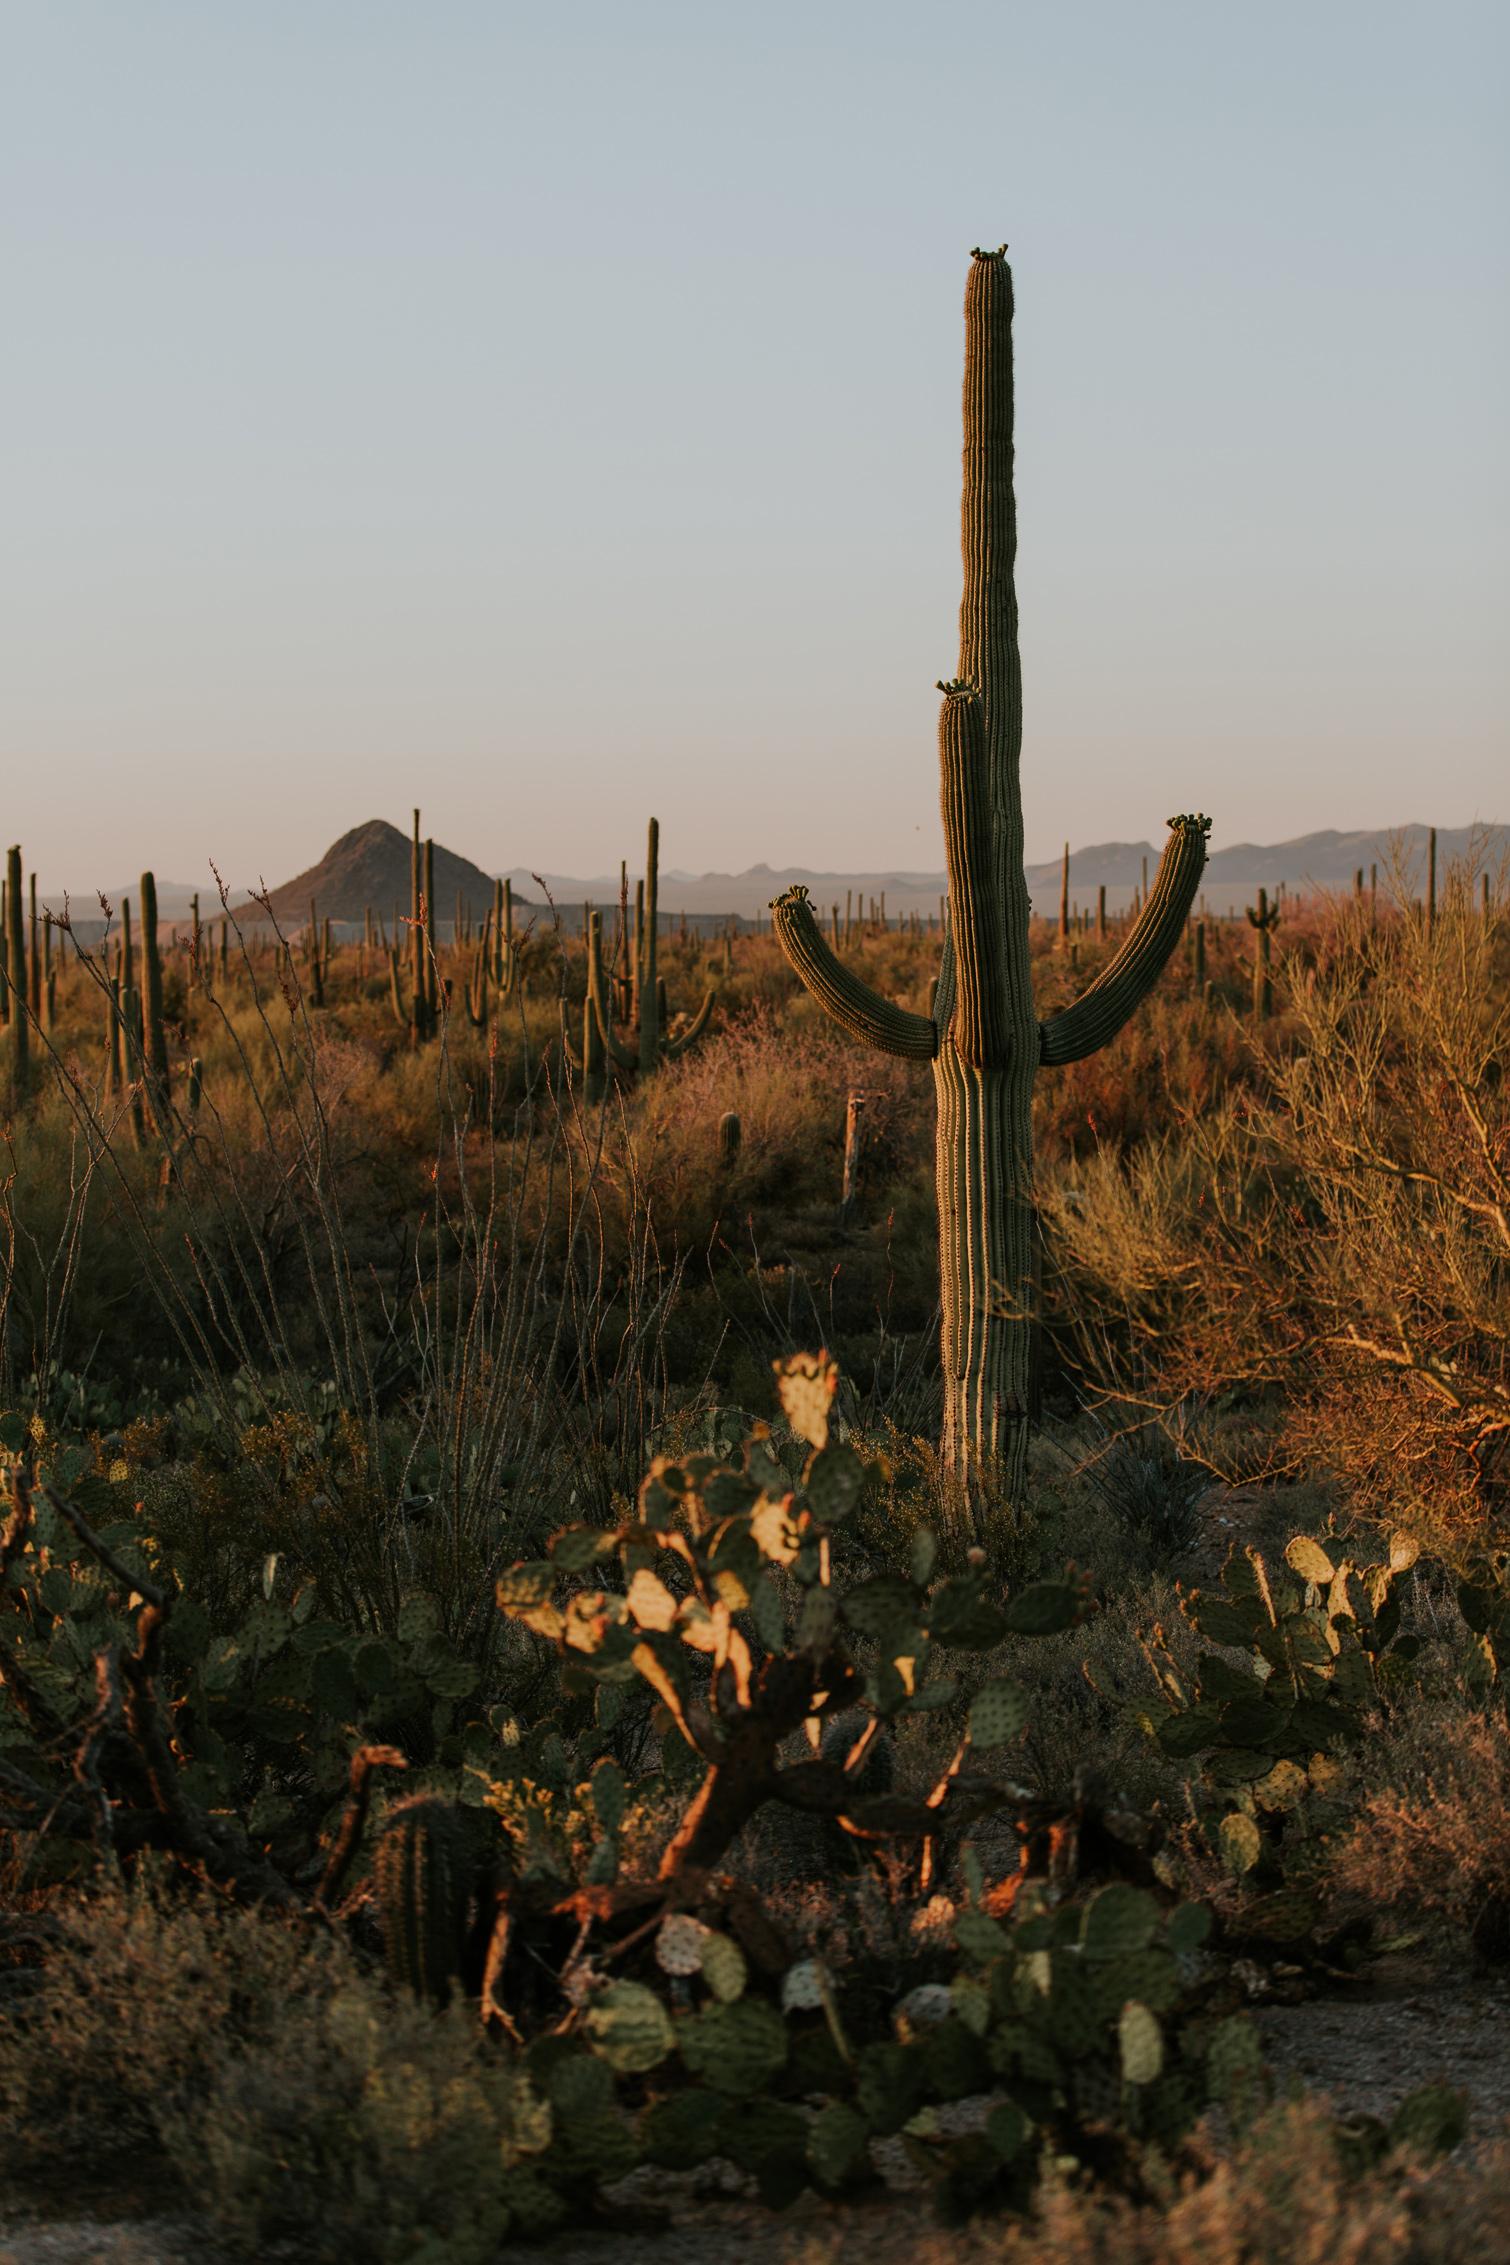 CindyGiovagnoli_Tucson_Arizona_Saguaro_National_Park_cactus_sunset_blooming_spring_sunset_petroglyphs_Native_American_indigenous-009.jpg